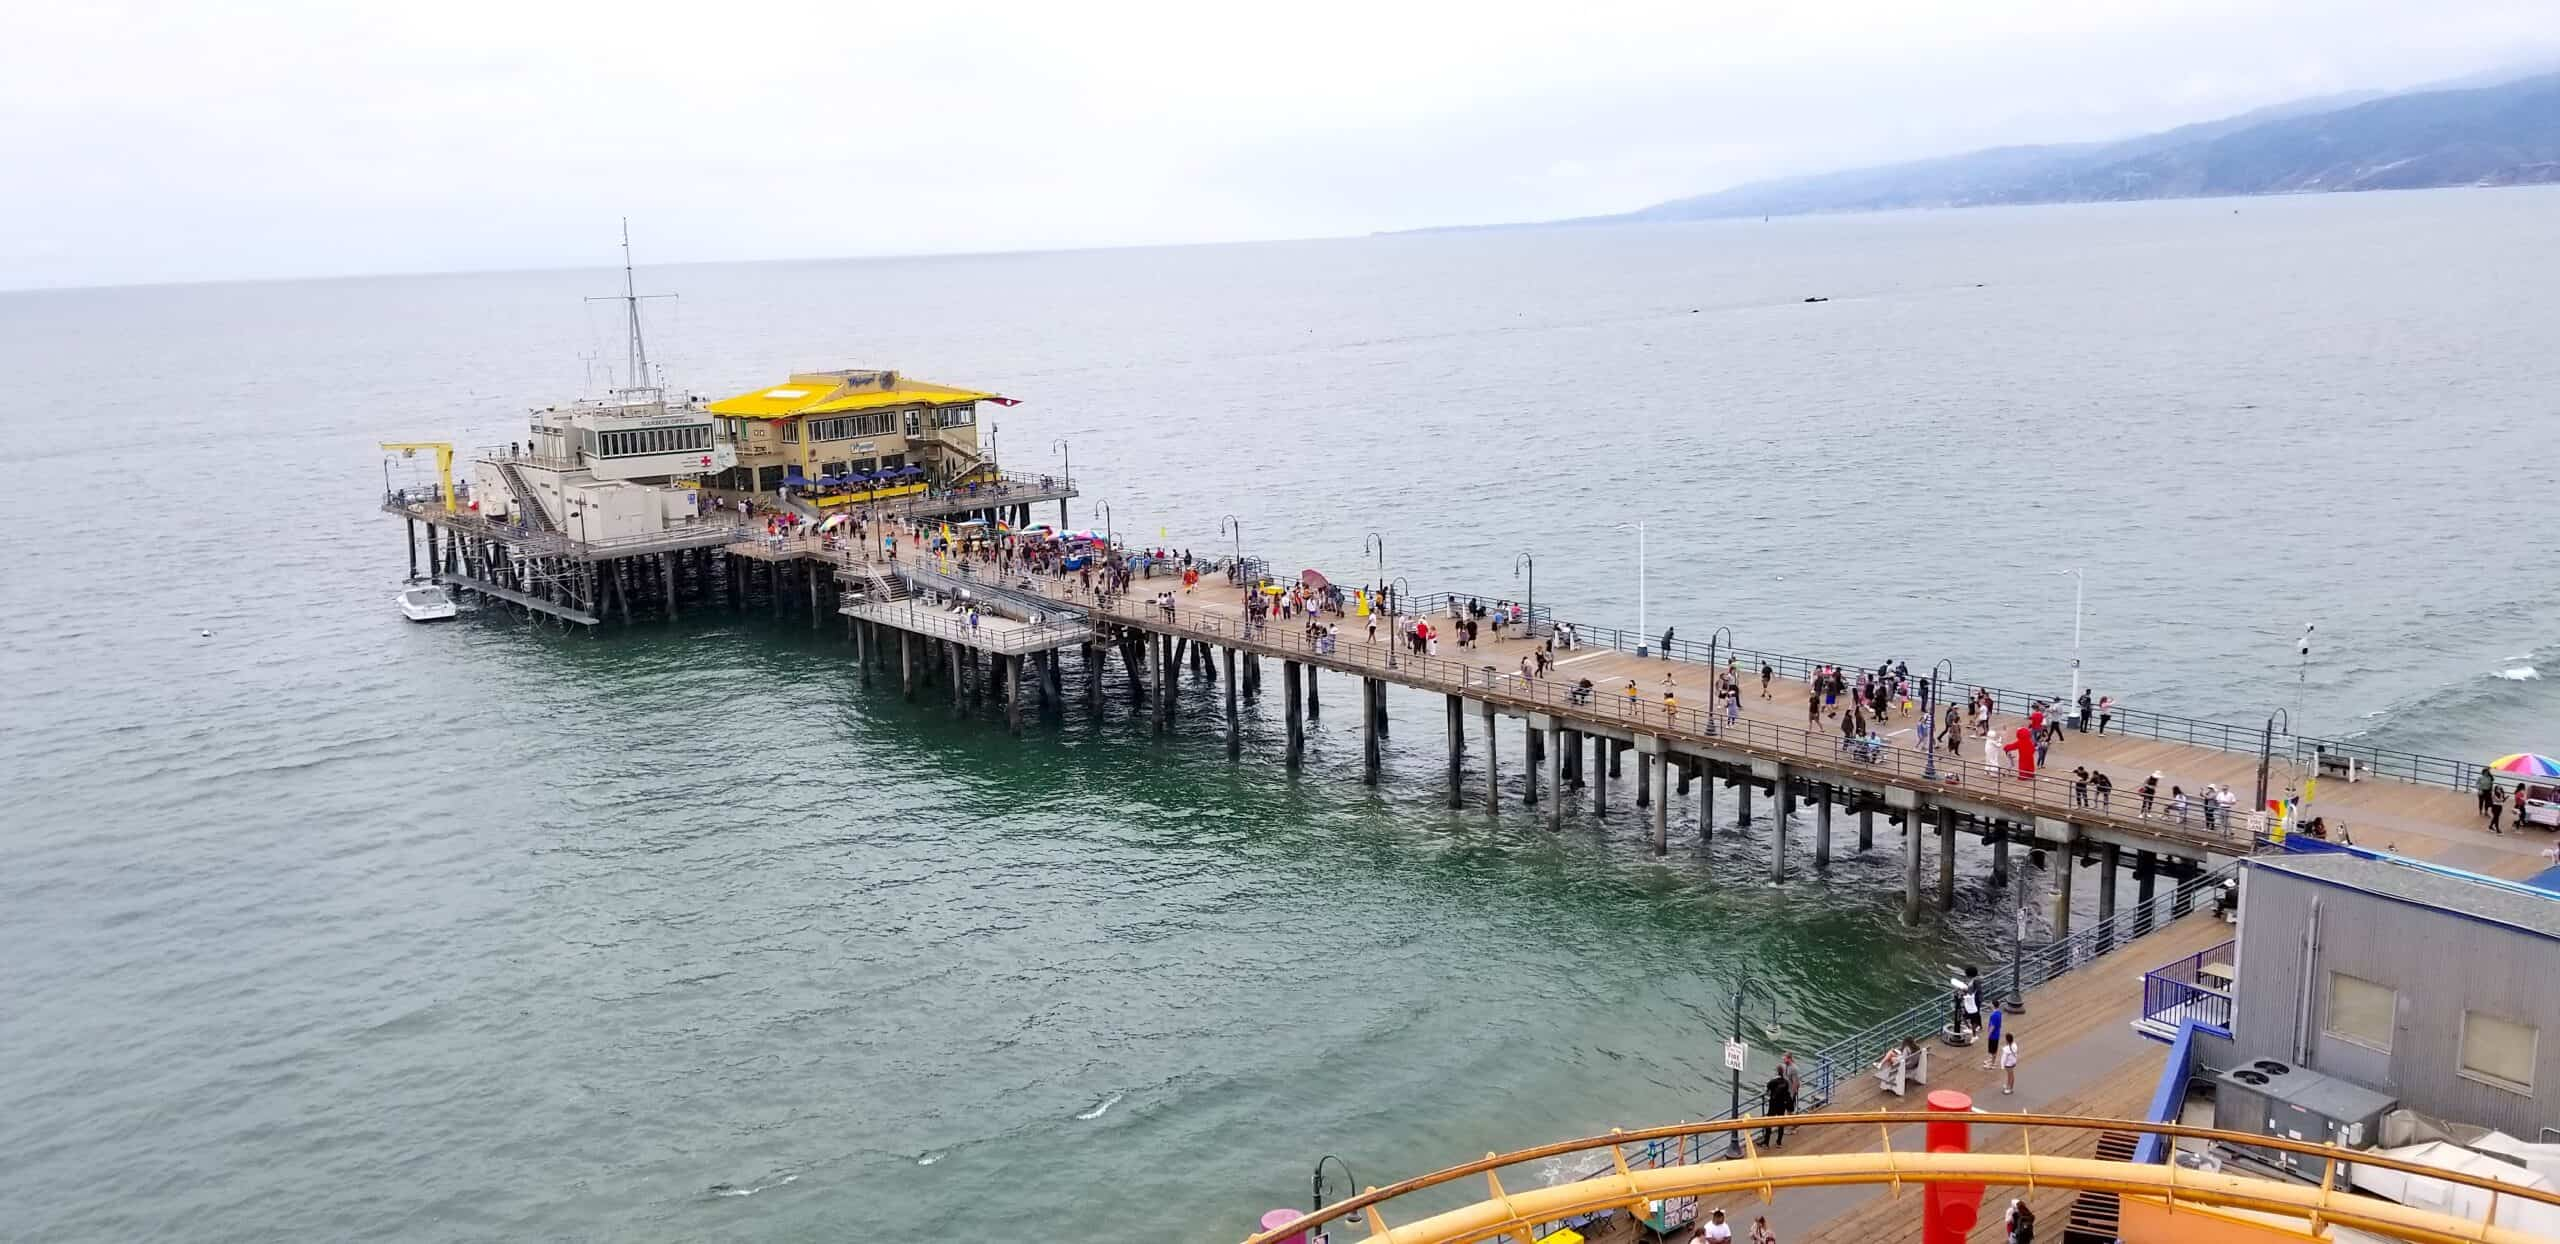 Santa Monica Pier from the ferris wheel